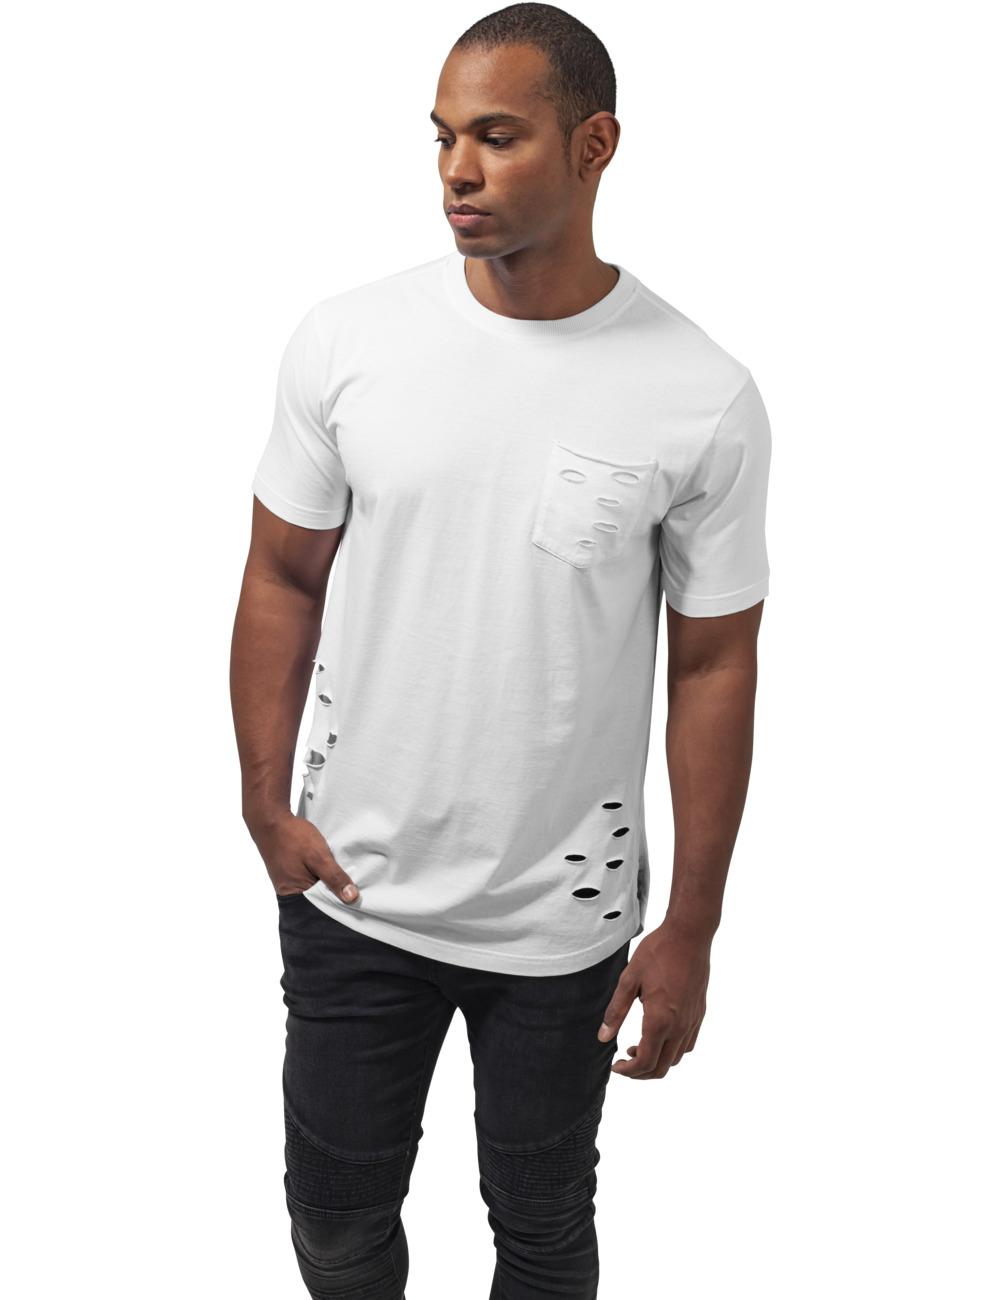 Urban Classics Herren Ripped Pocket Tee XL, White (220)